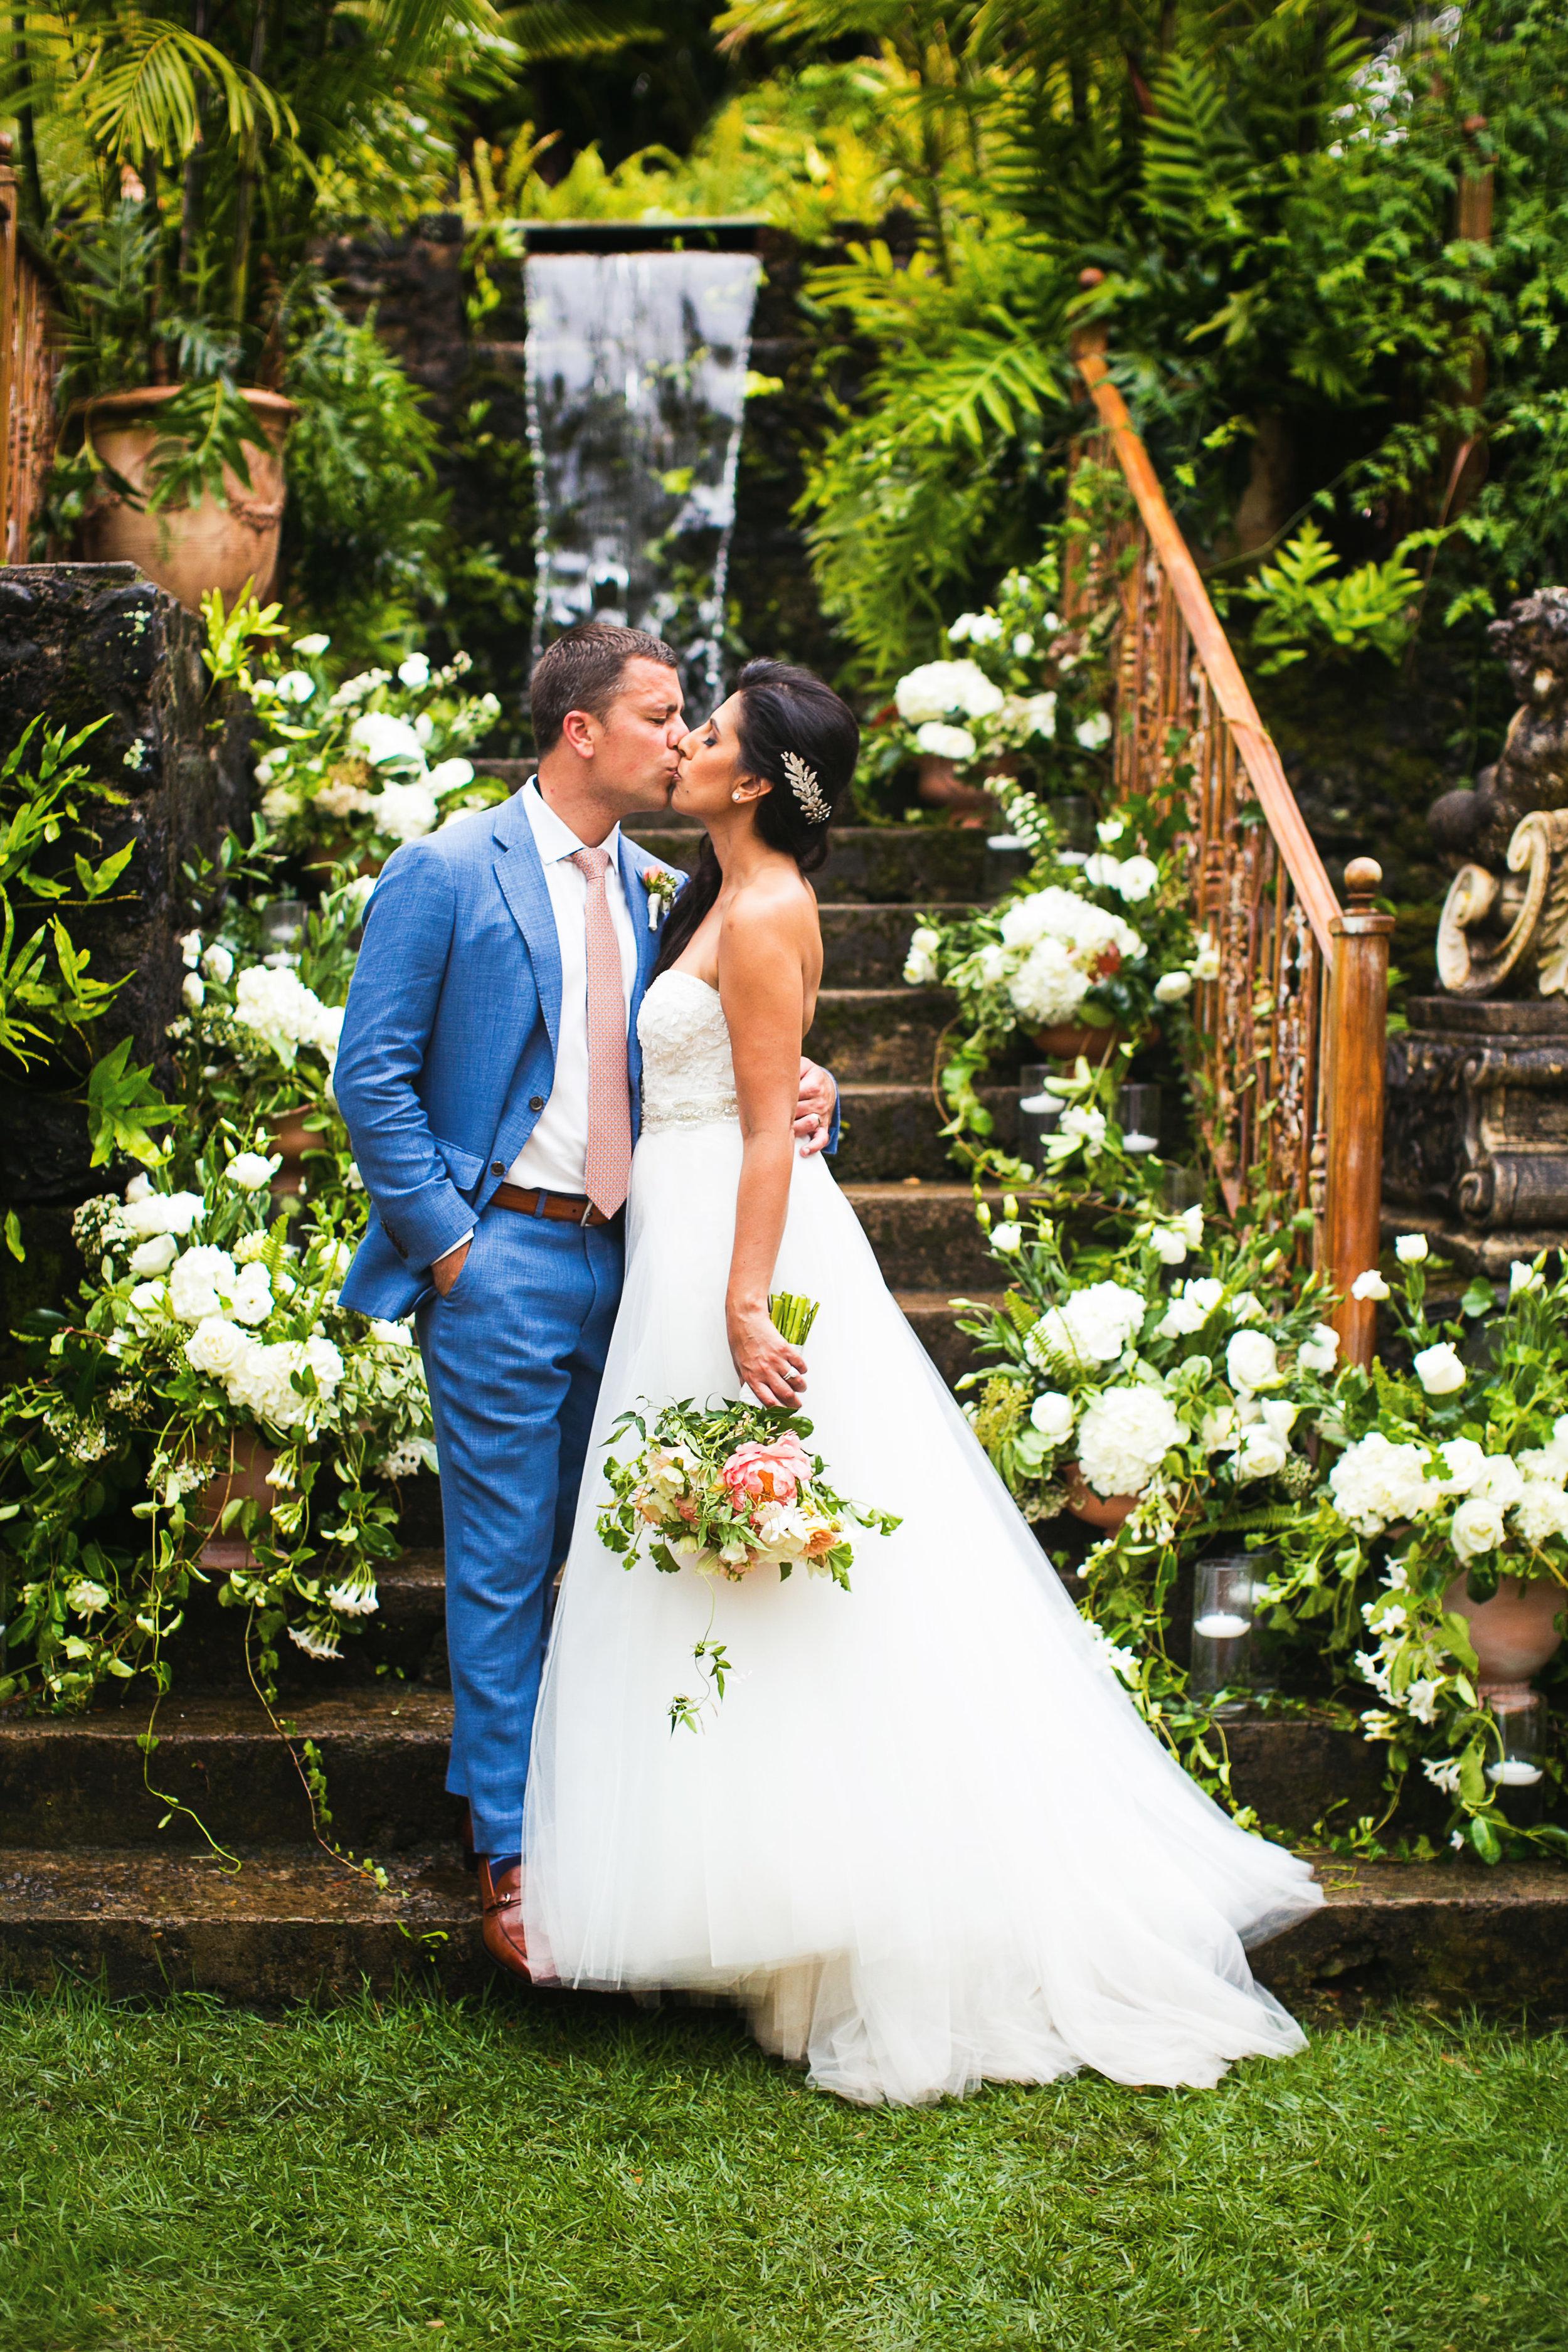 160507-Shaila-Wedding-4183-Edit.jpg